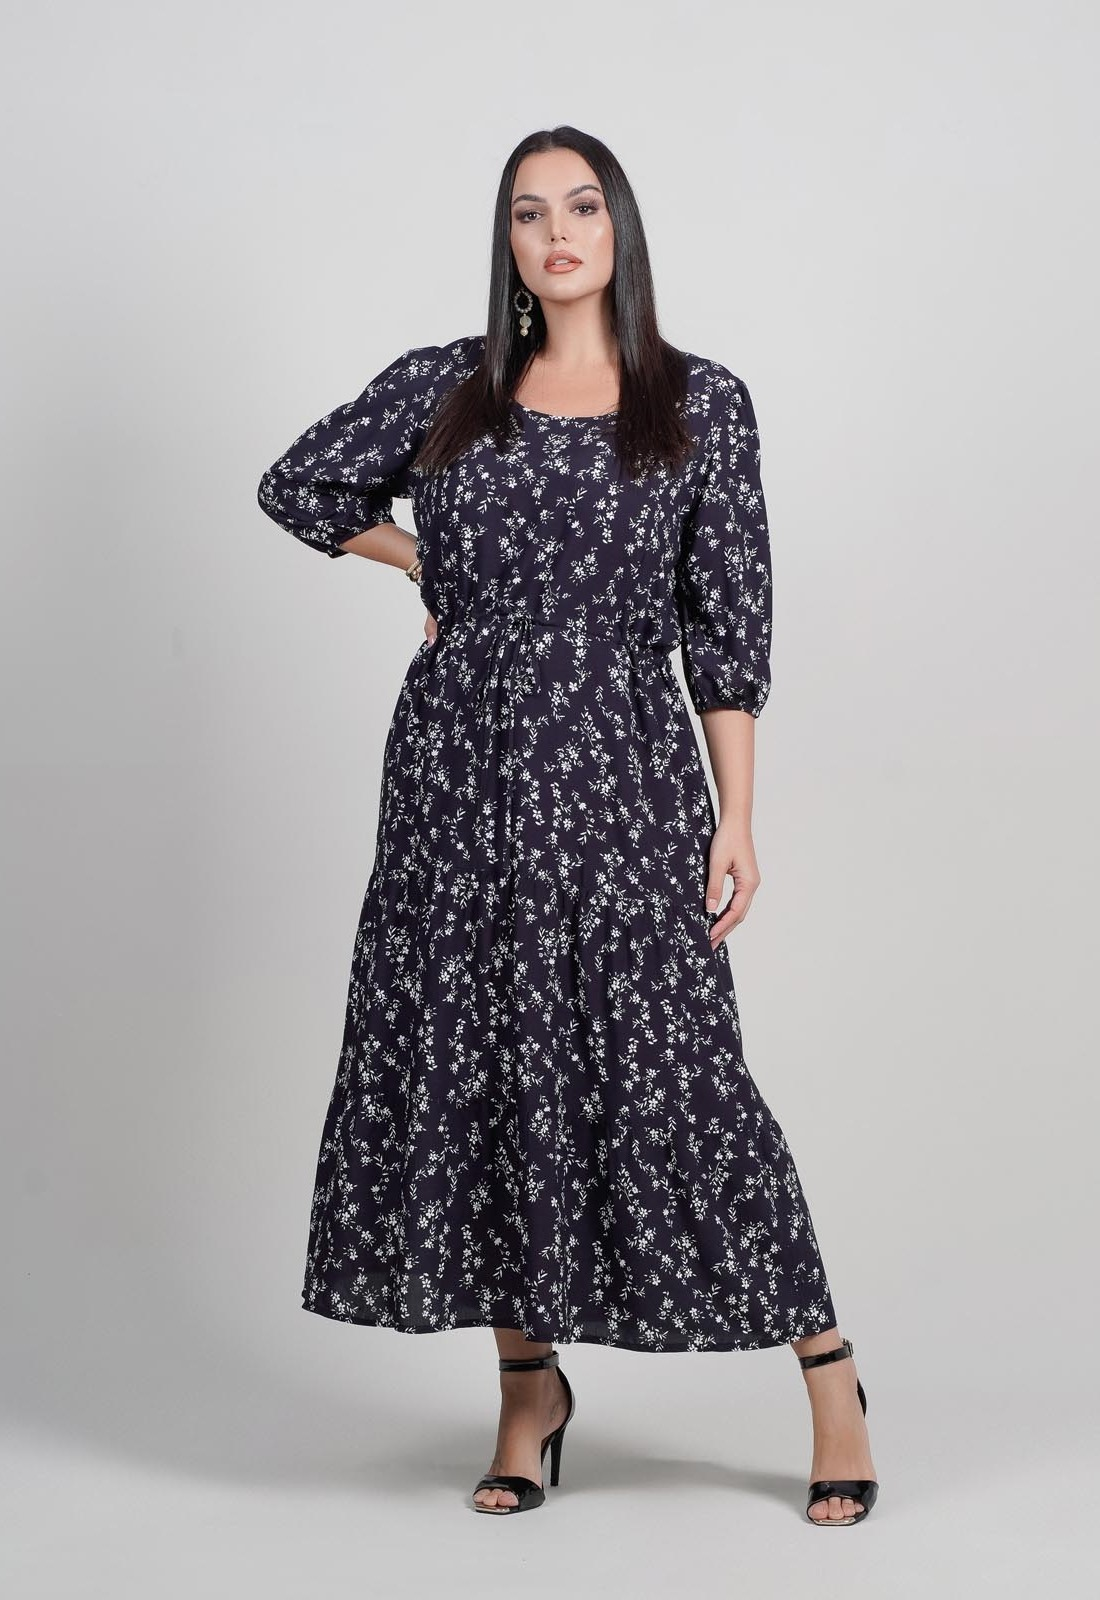 Vestido estampado  plus size com manga 3/4  Ref. U64421